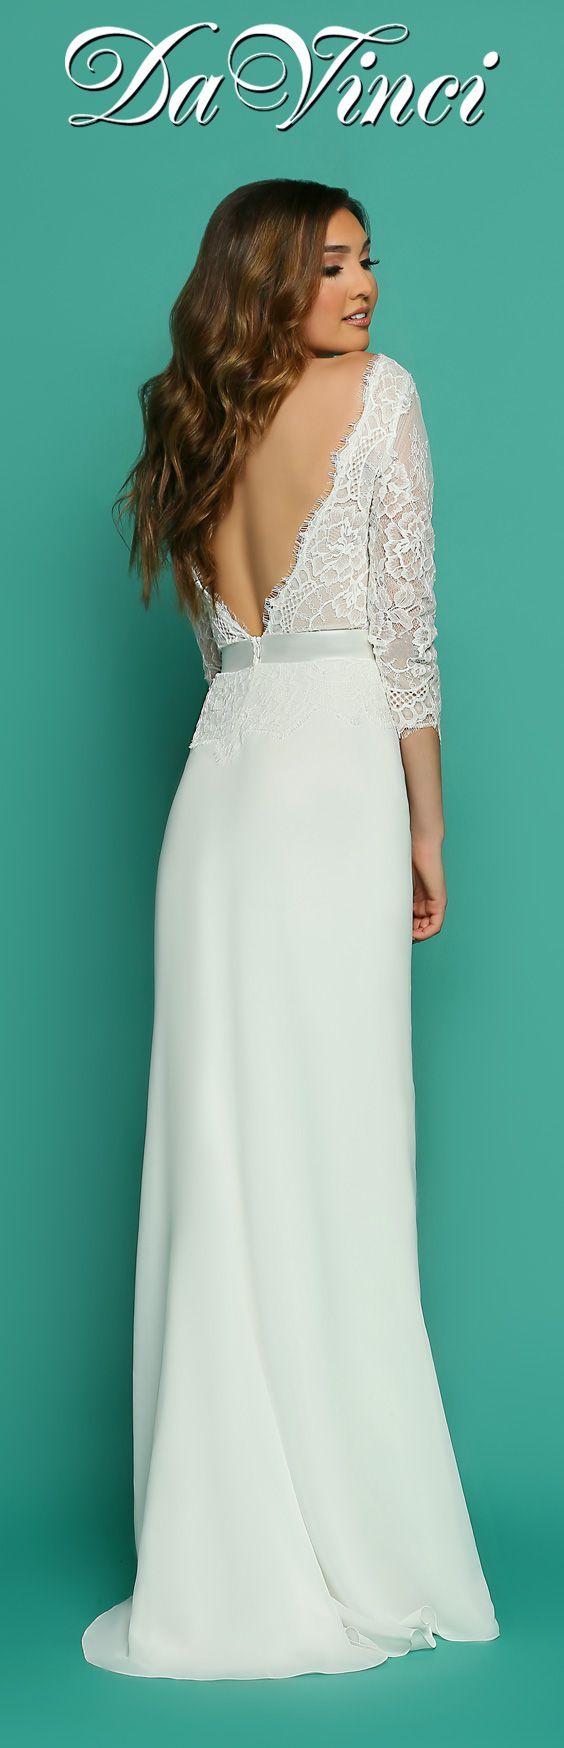 287 best Gorgeous Backs images on Pinterest | Short wedding gowns ...